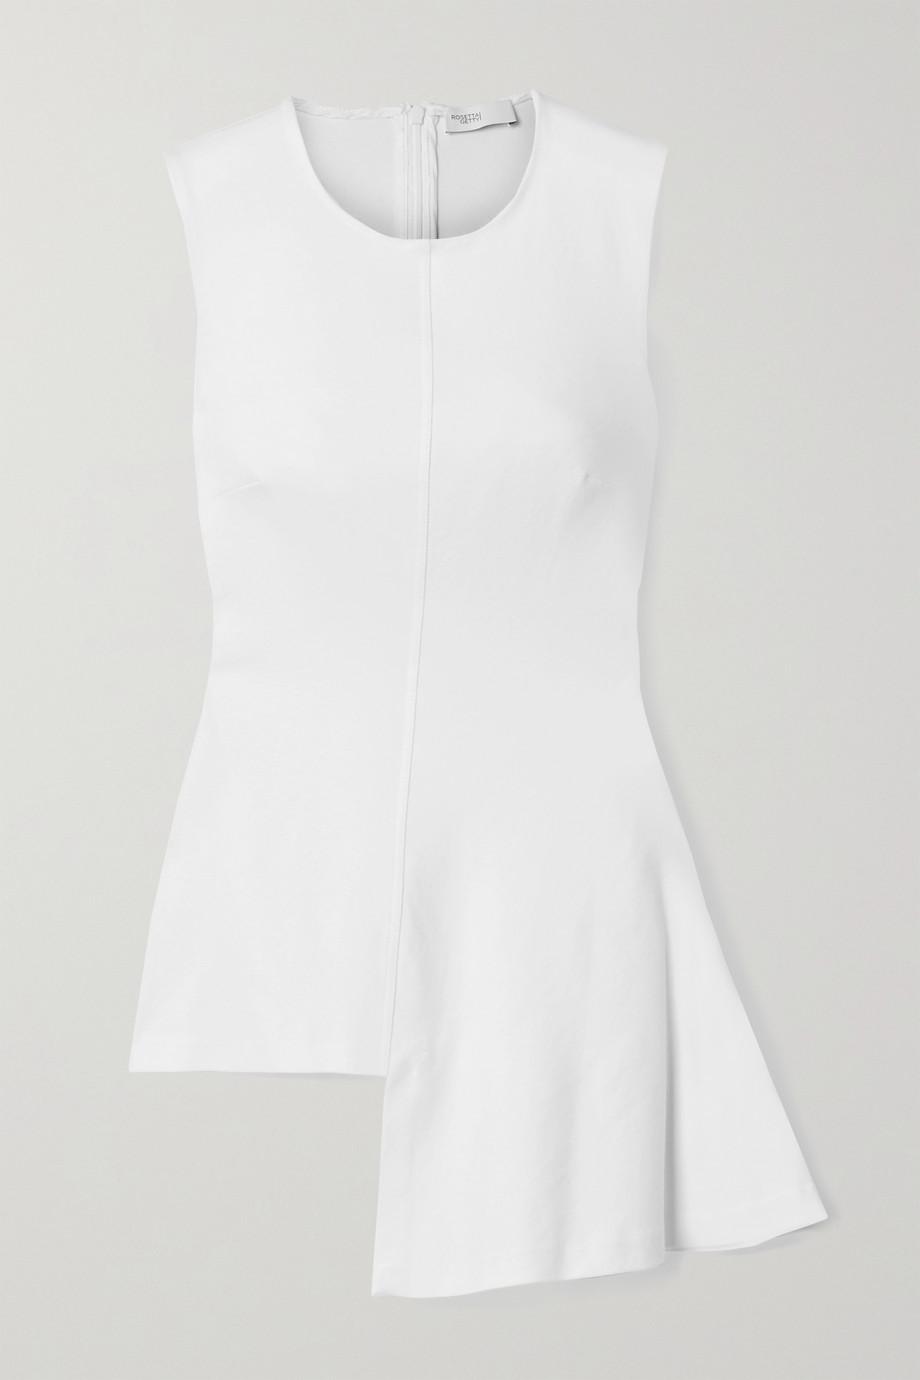 Rosetta Getty Asymmetric draped stretch-jersey top